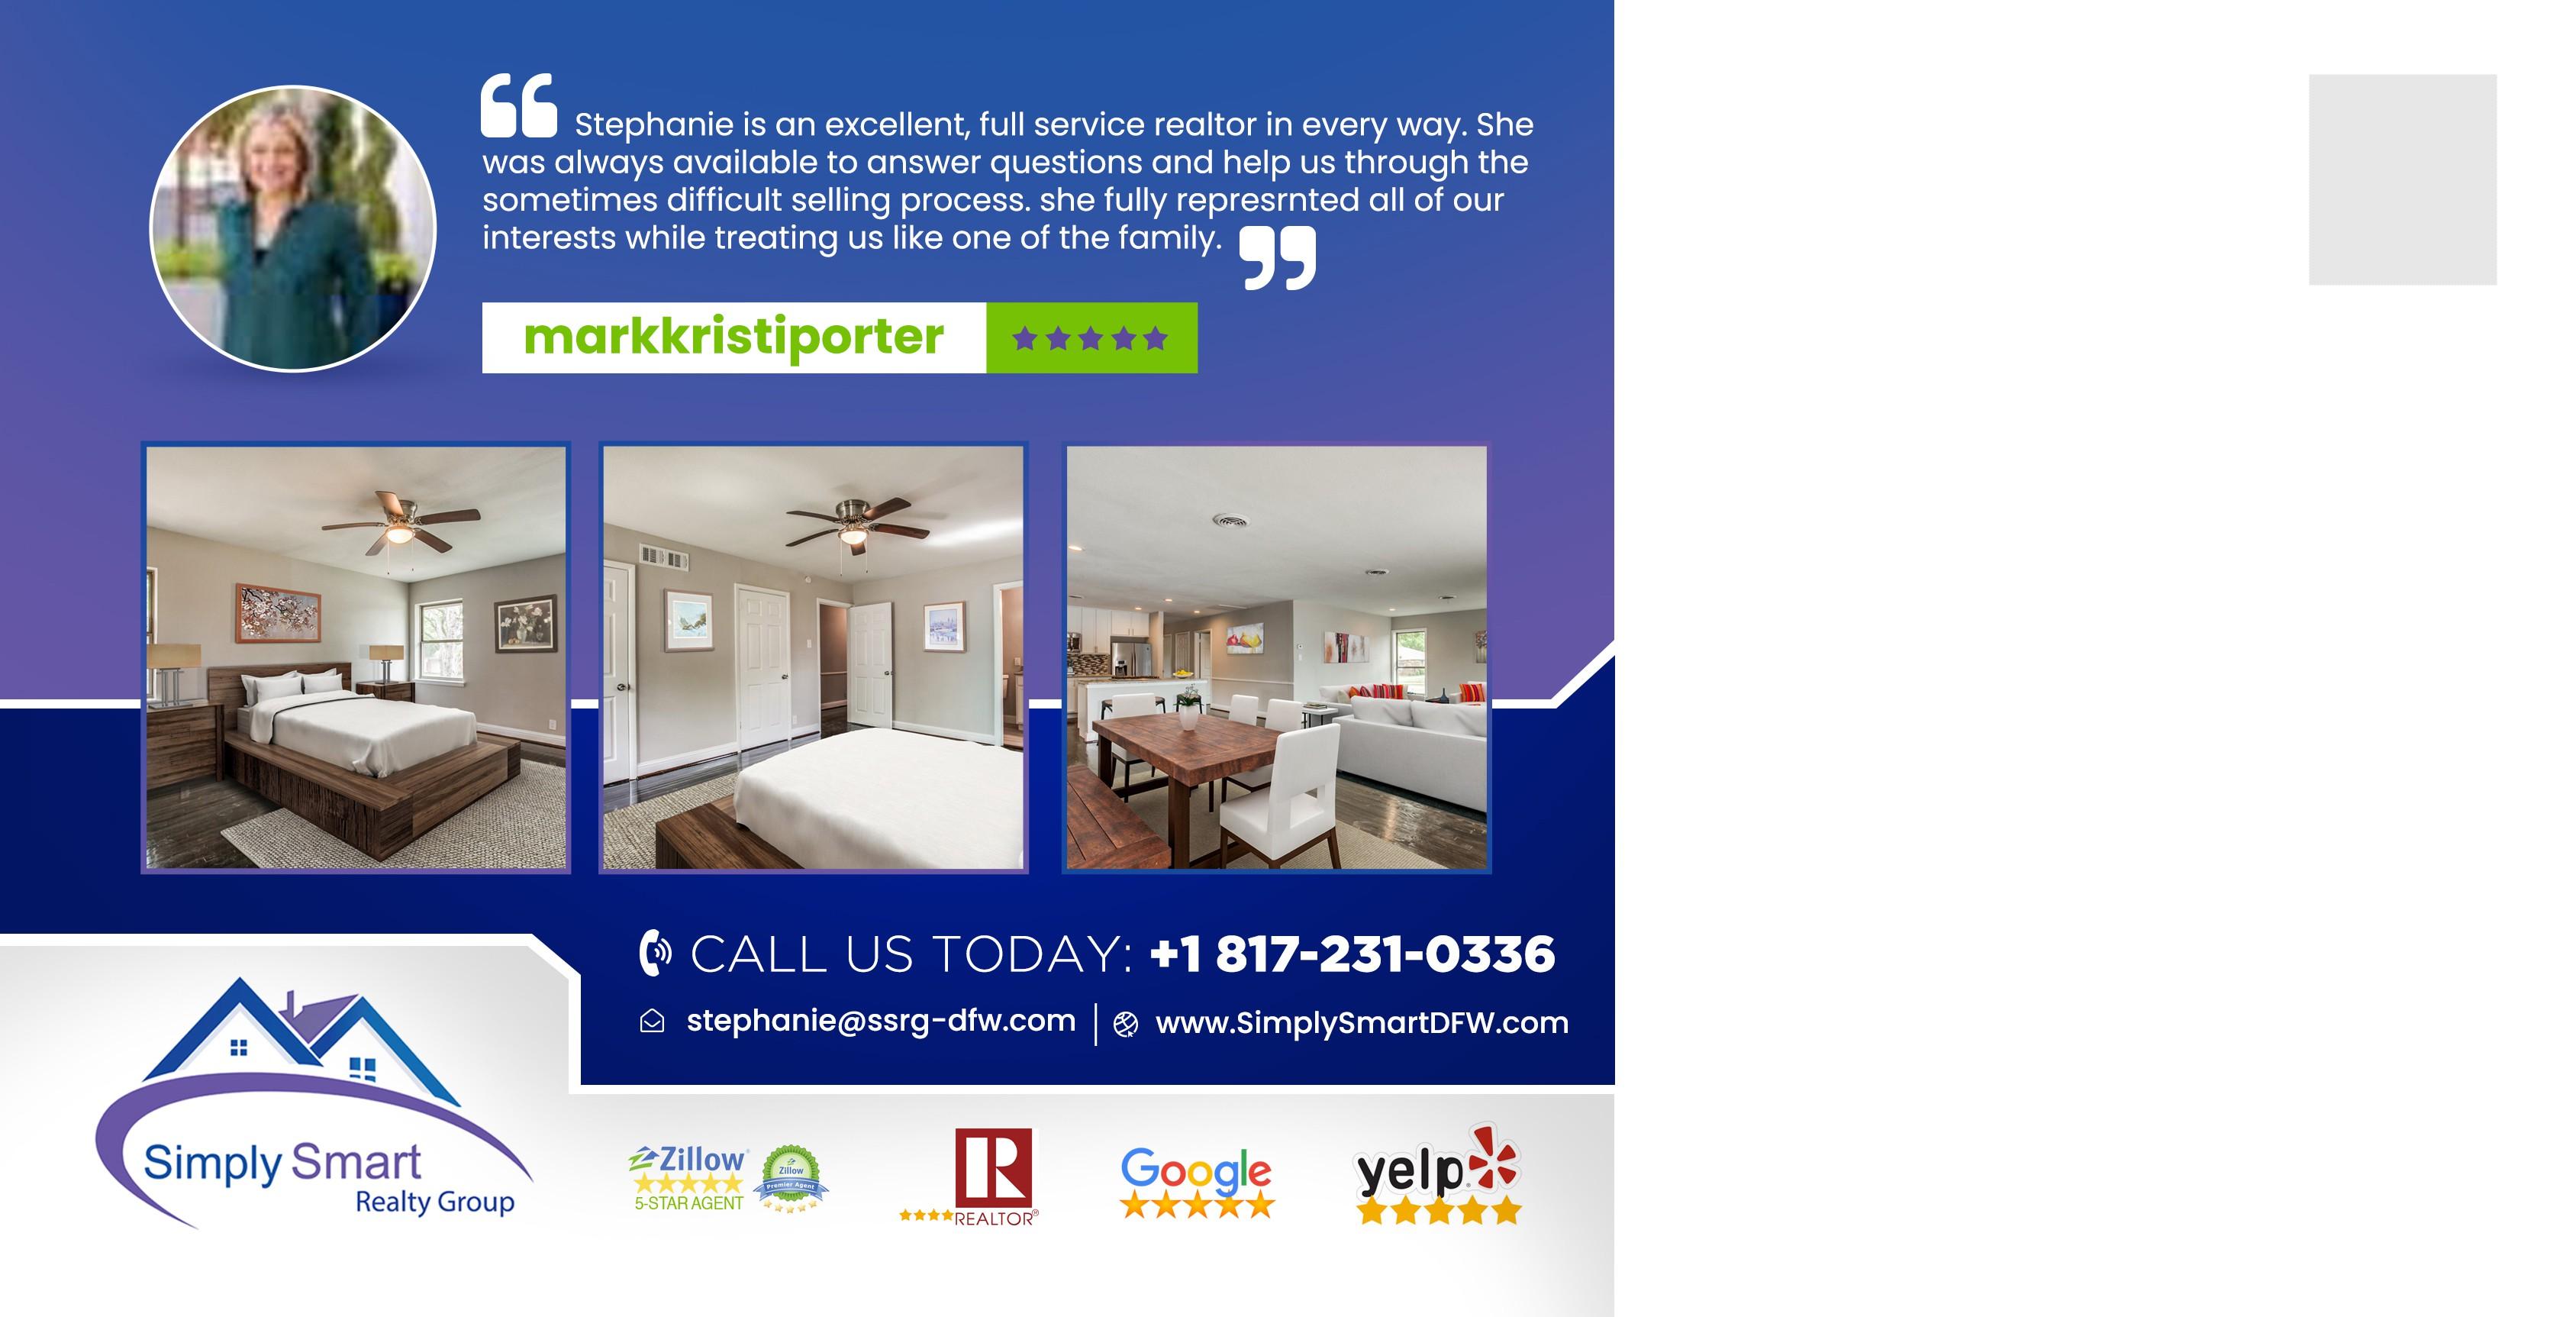 Marketing Postcard for Real Estate Company